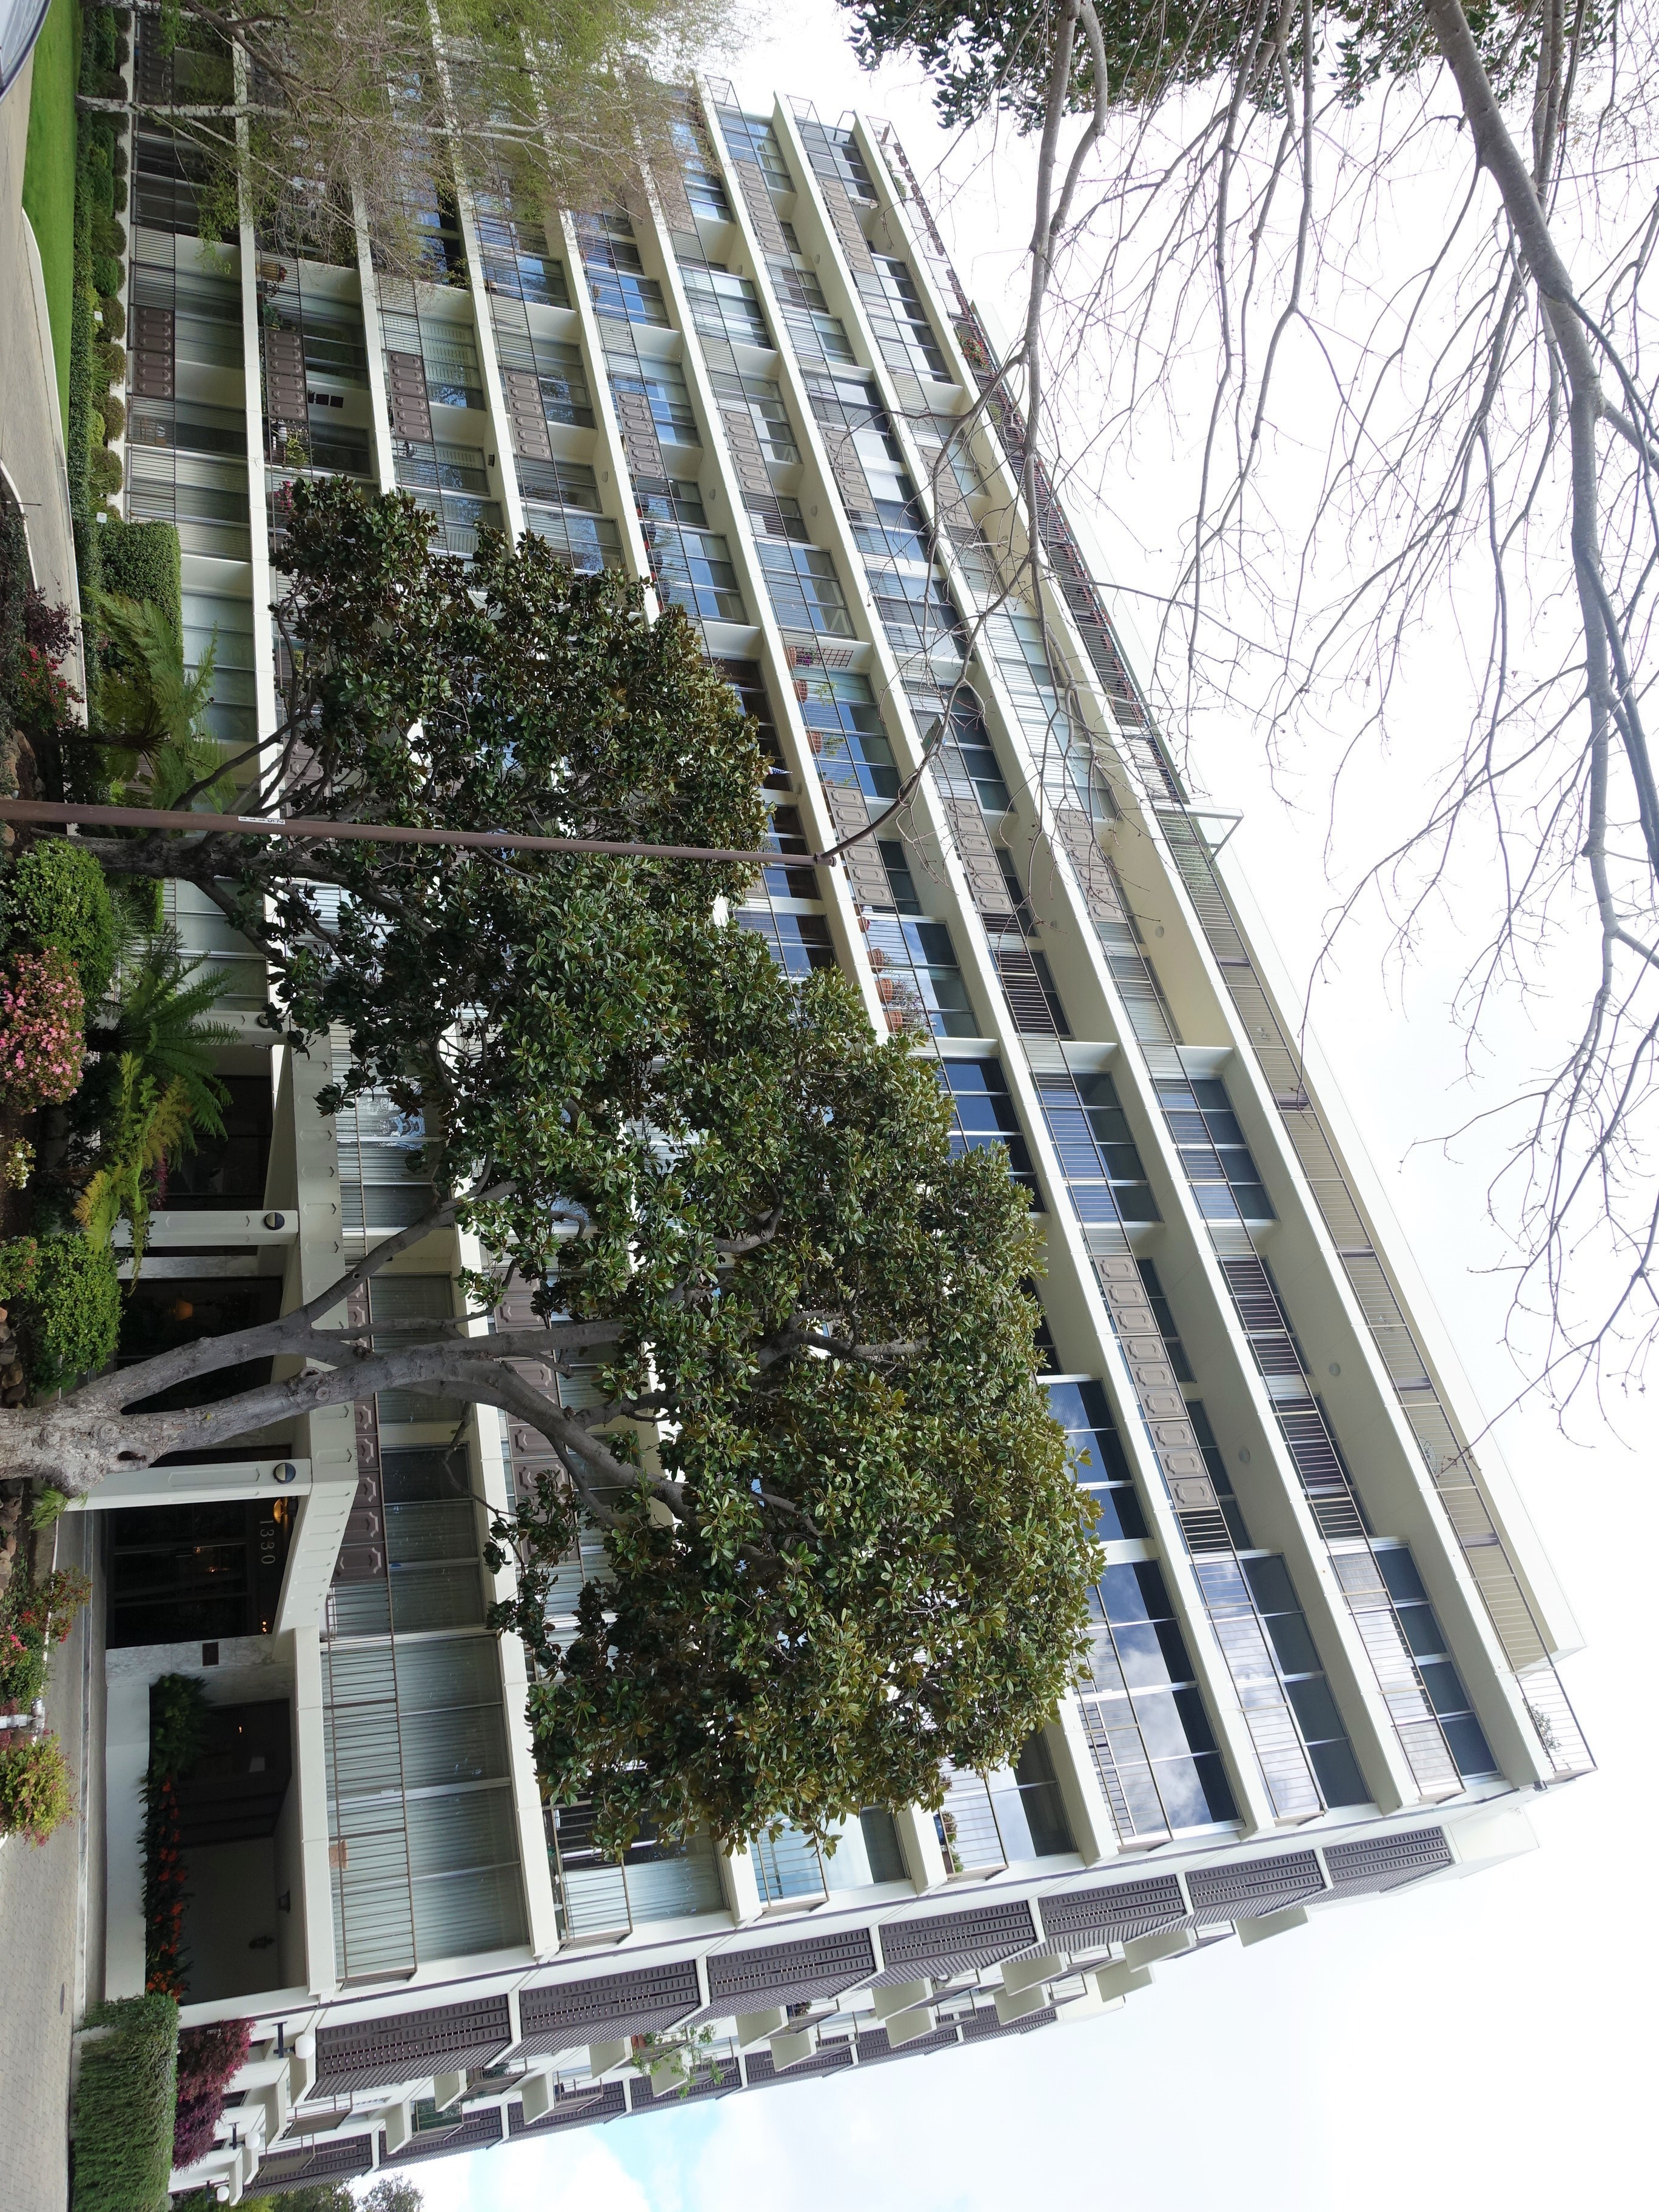 1330 University Drive  #84, Menlo Park, CA, 94025